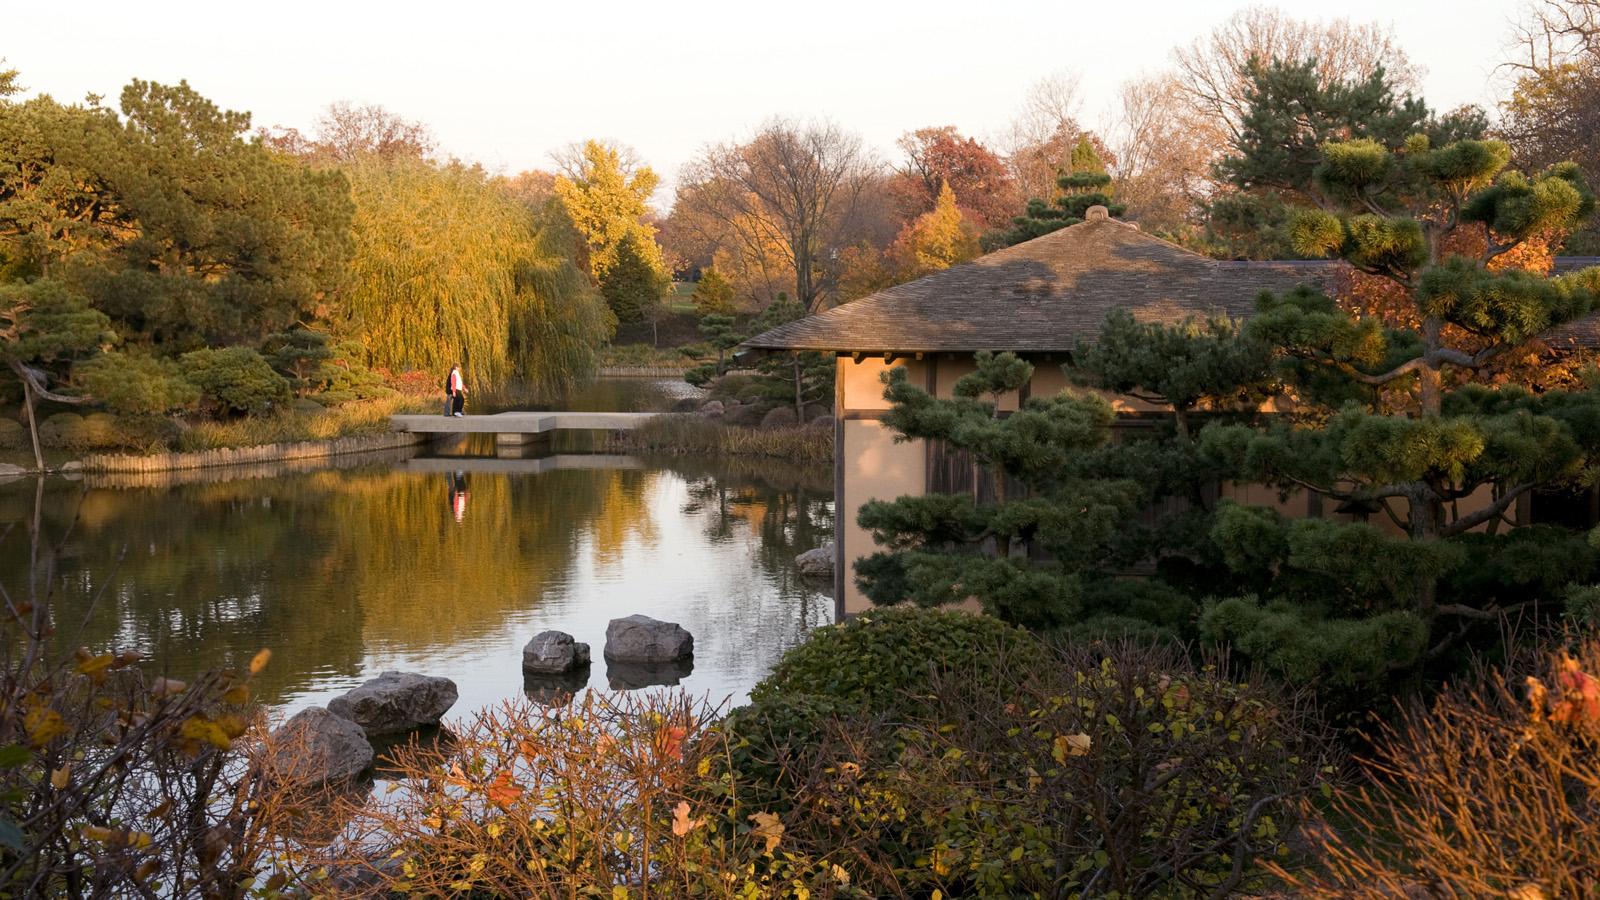 Koichi Kawana | The Cultural Landscape Foundation